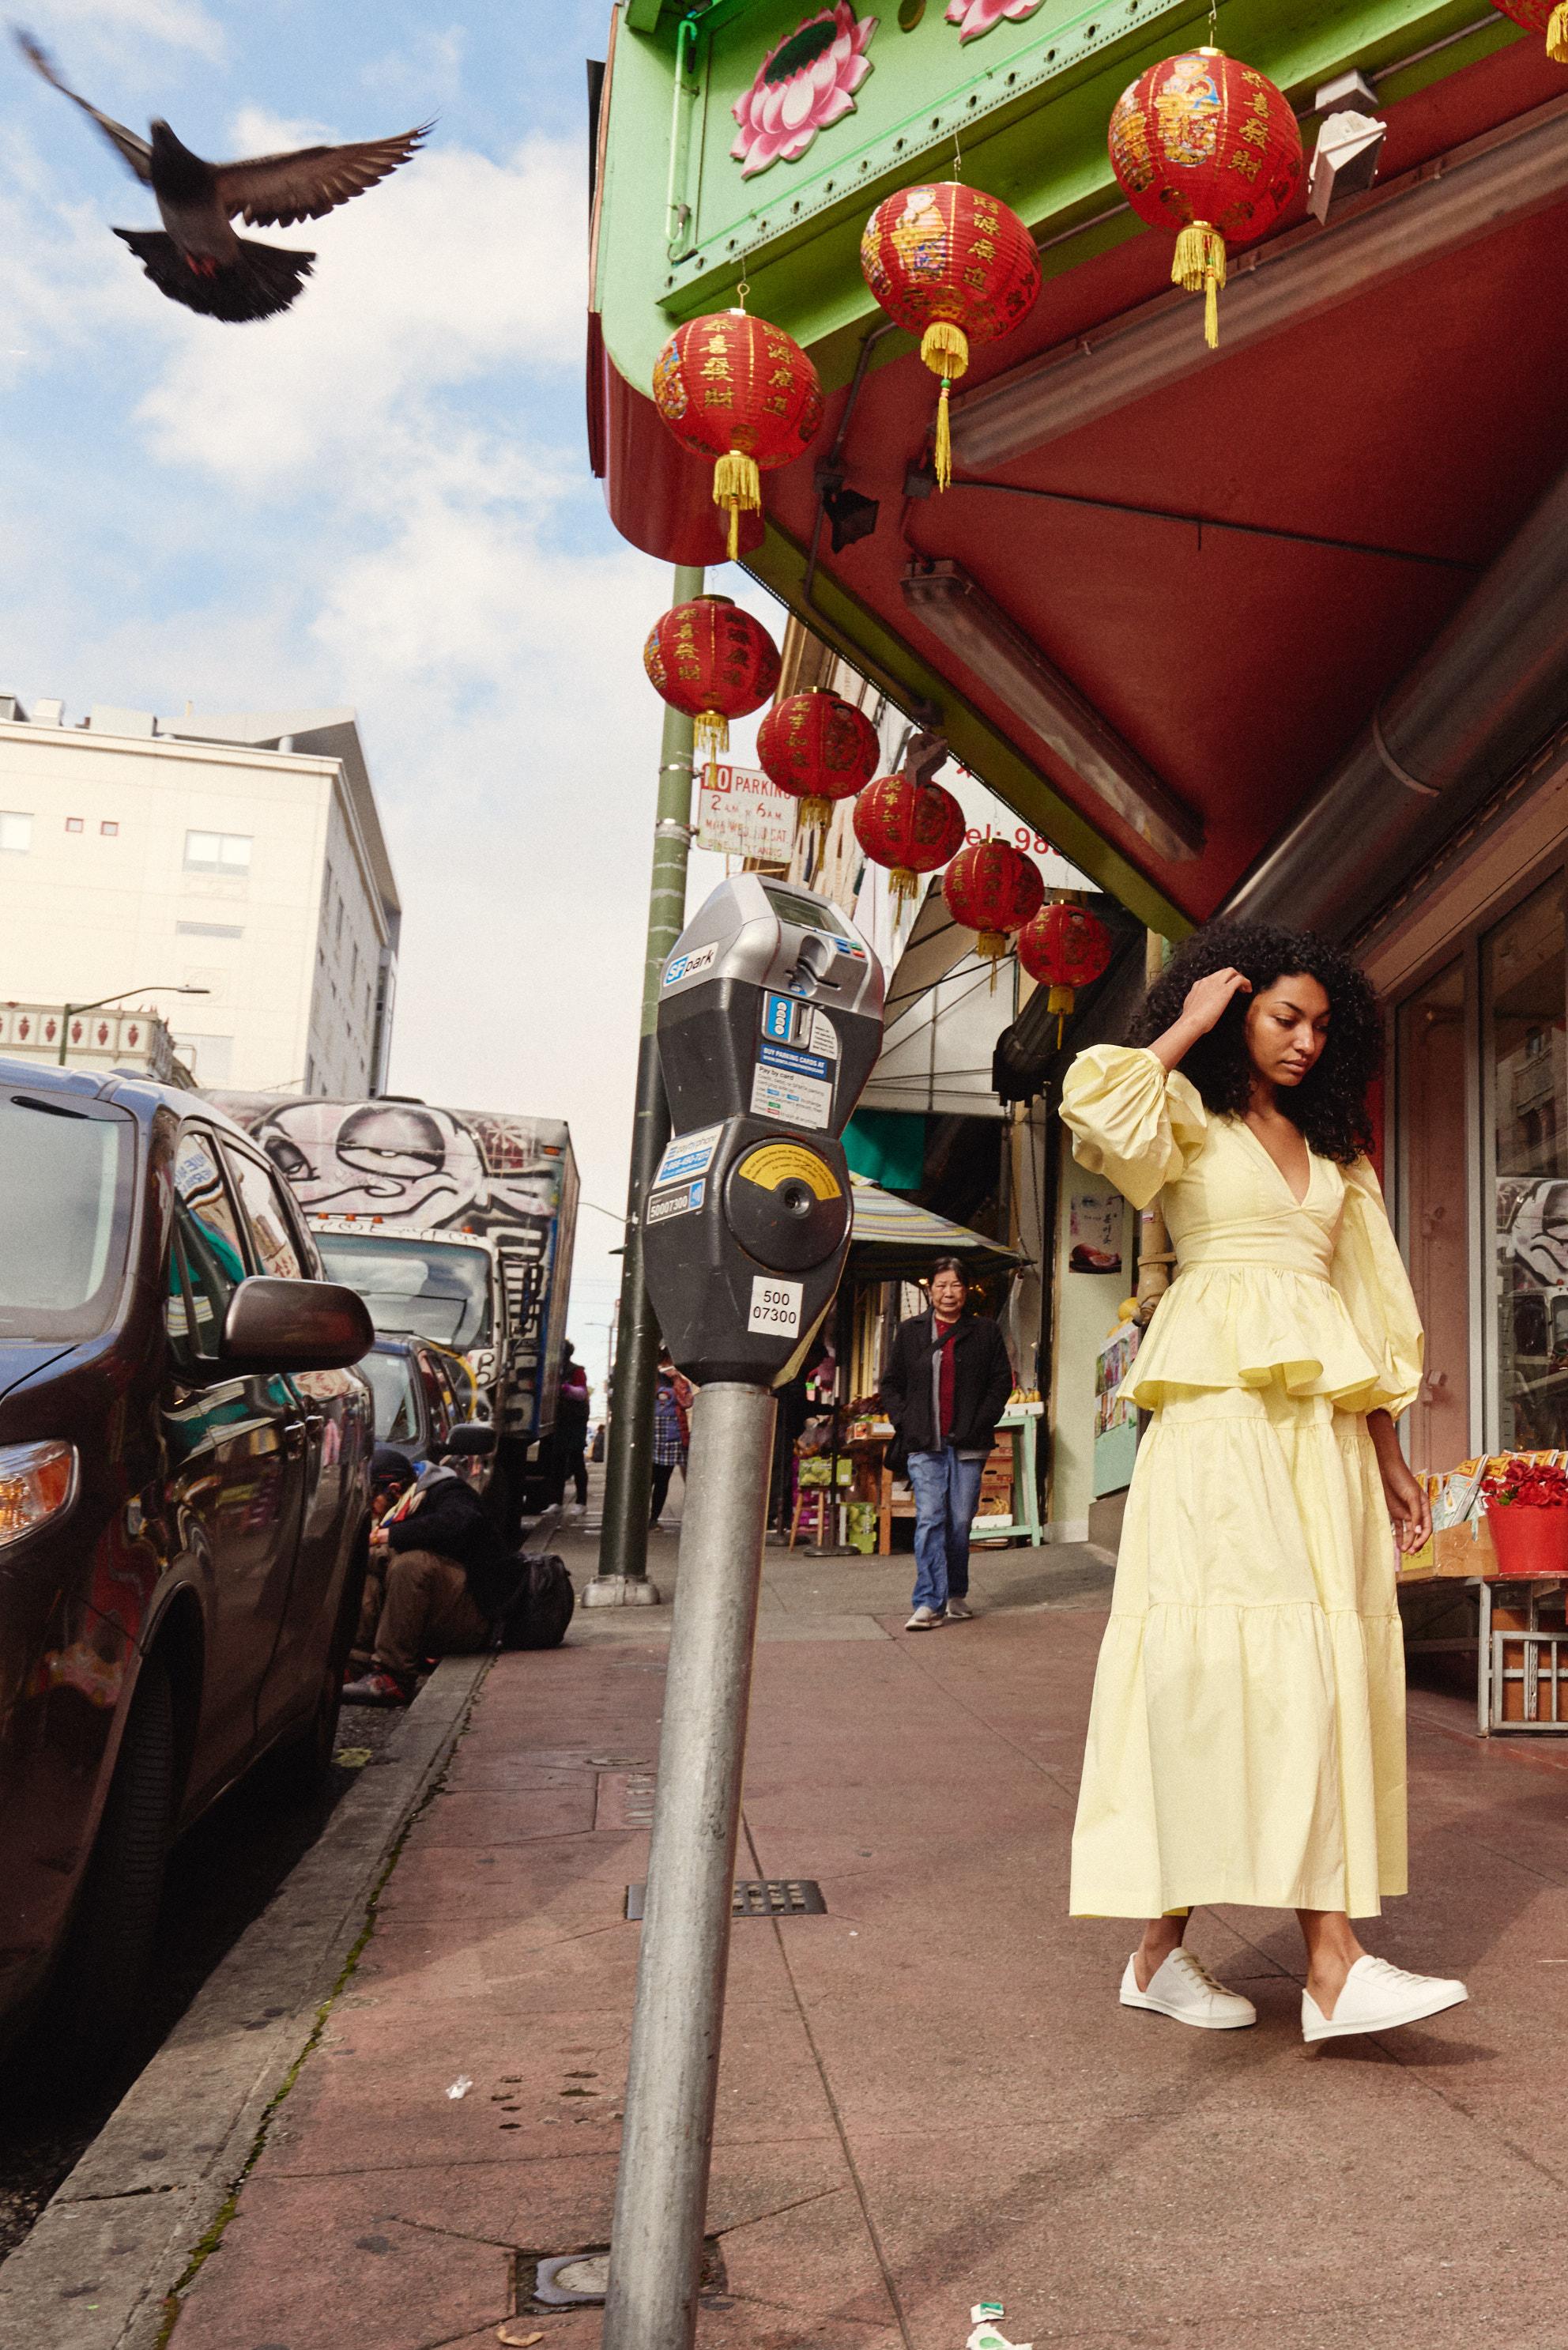 FredaSalvador_Chinatown3.19_012.jpg